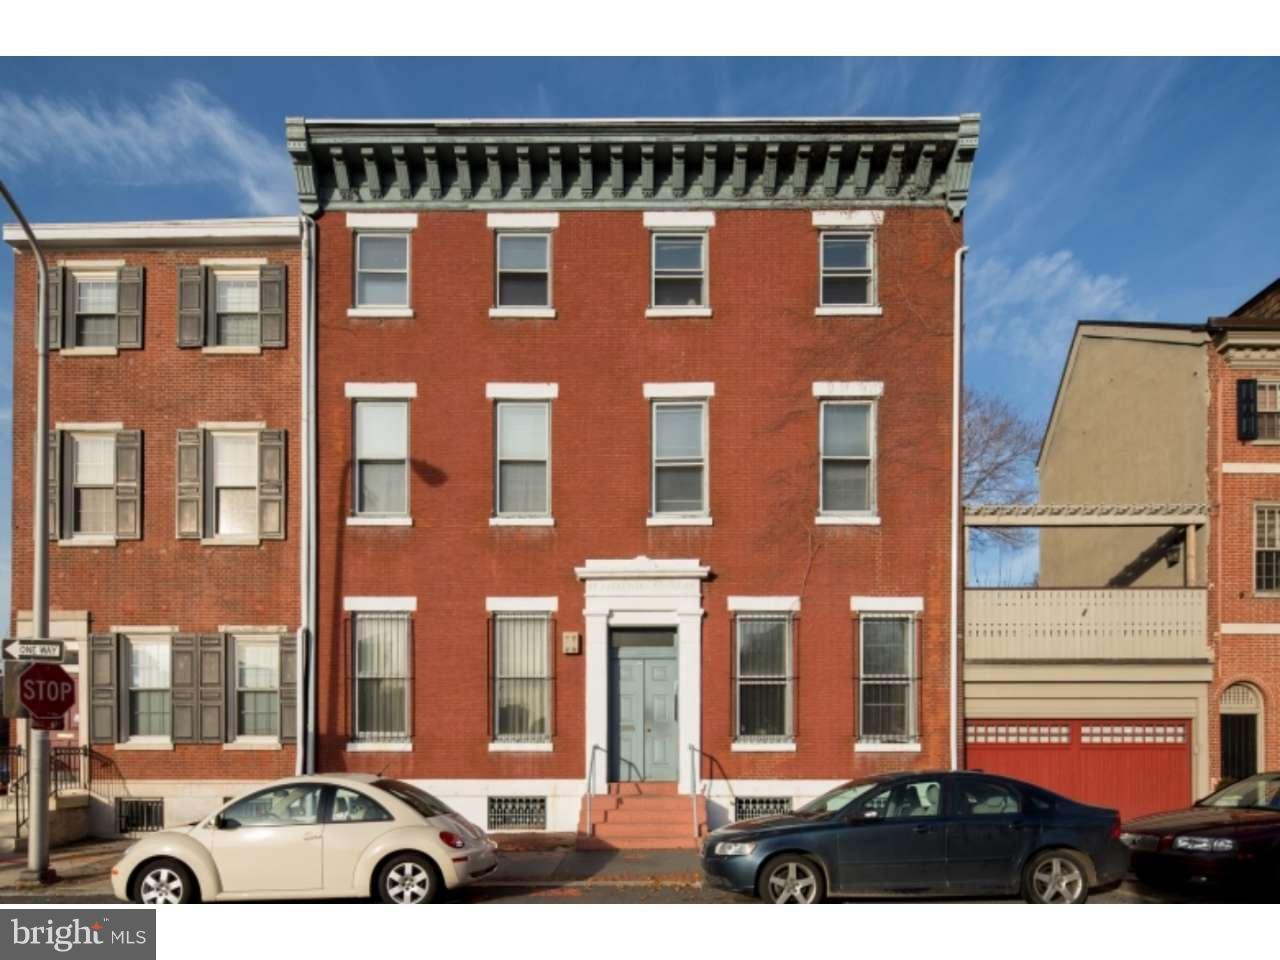 427 Vine Street #2 Philadelphia, PA 19106